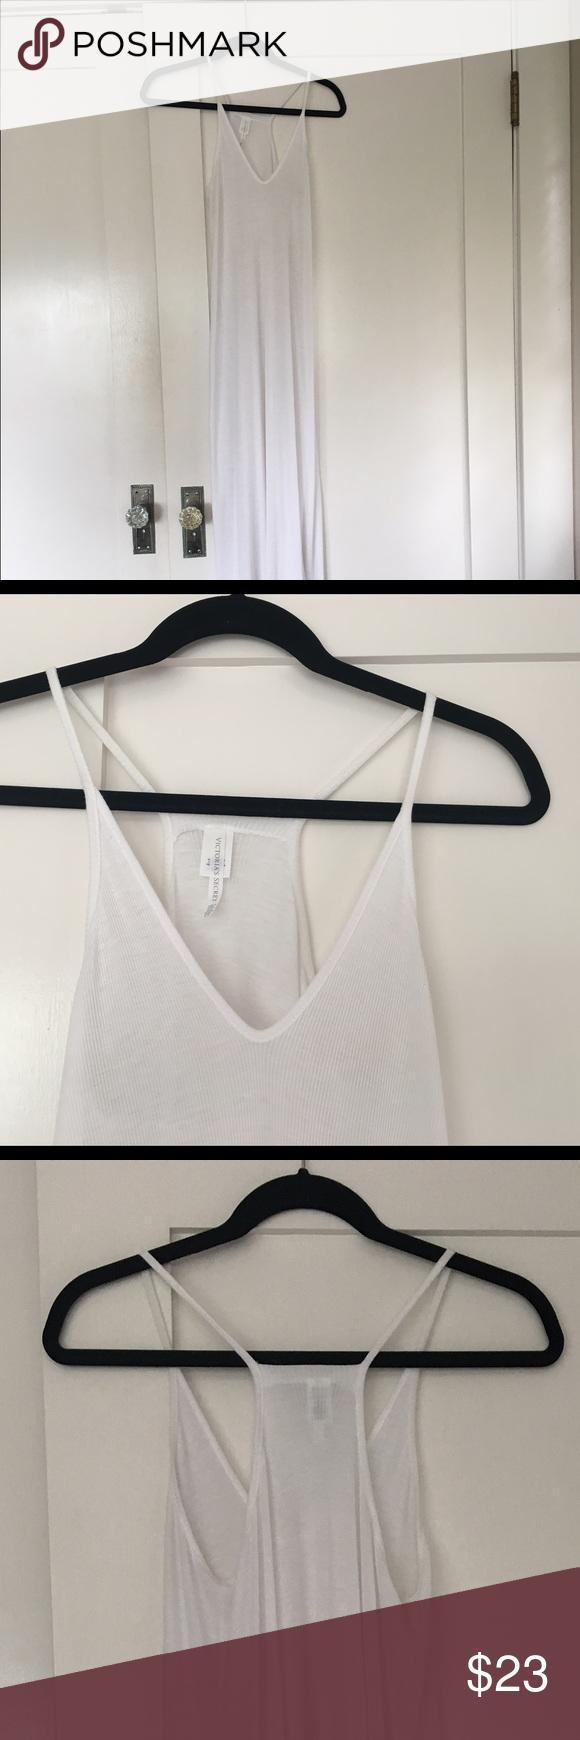 Victoria's Secret maxi dress size s-m Jersey material. Fits s-m PINK Victoria's Secret Dresses Maxi